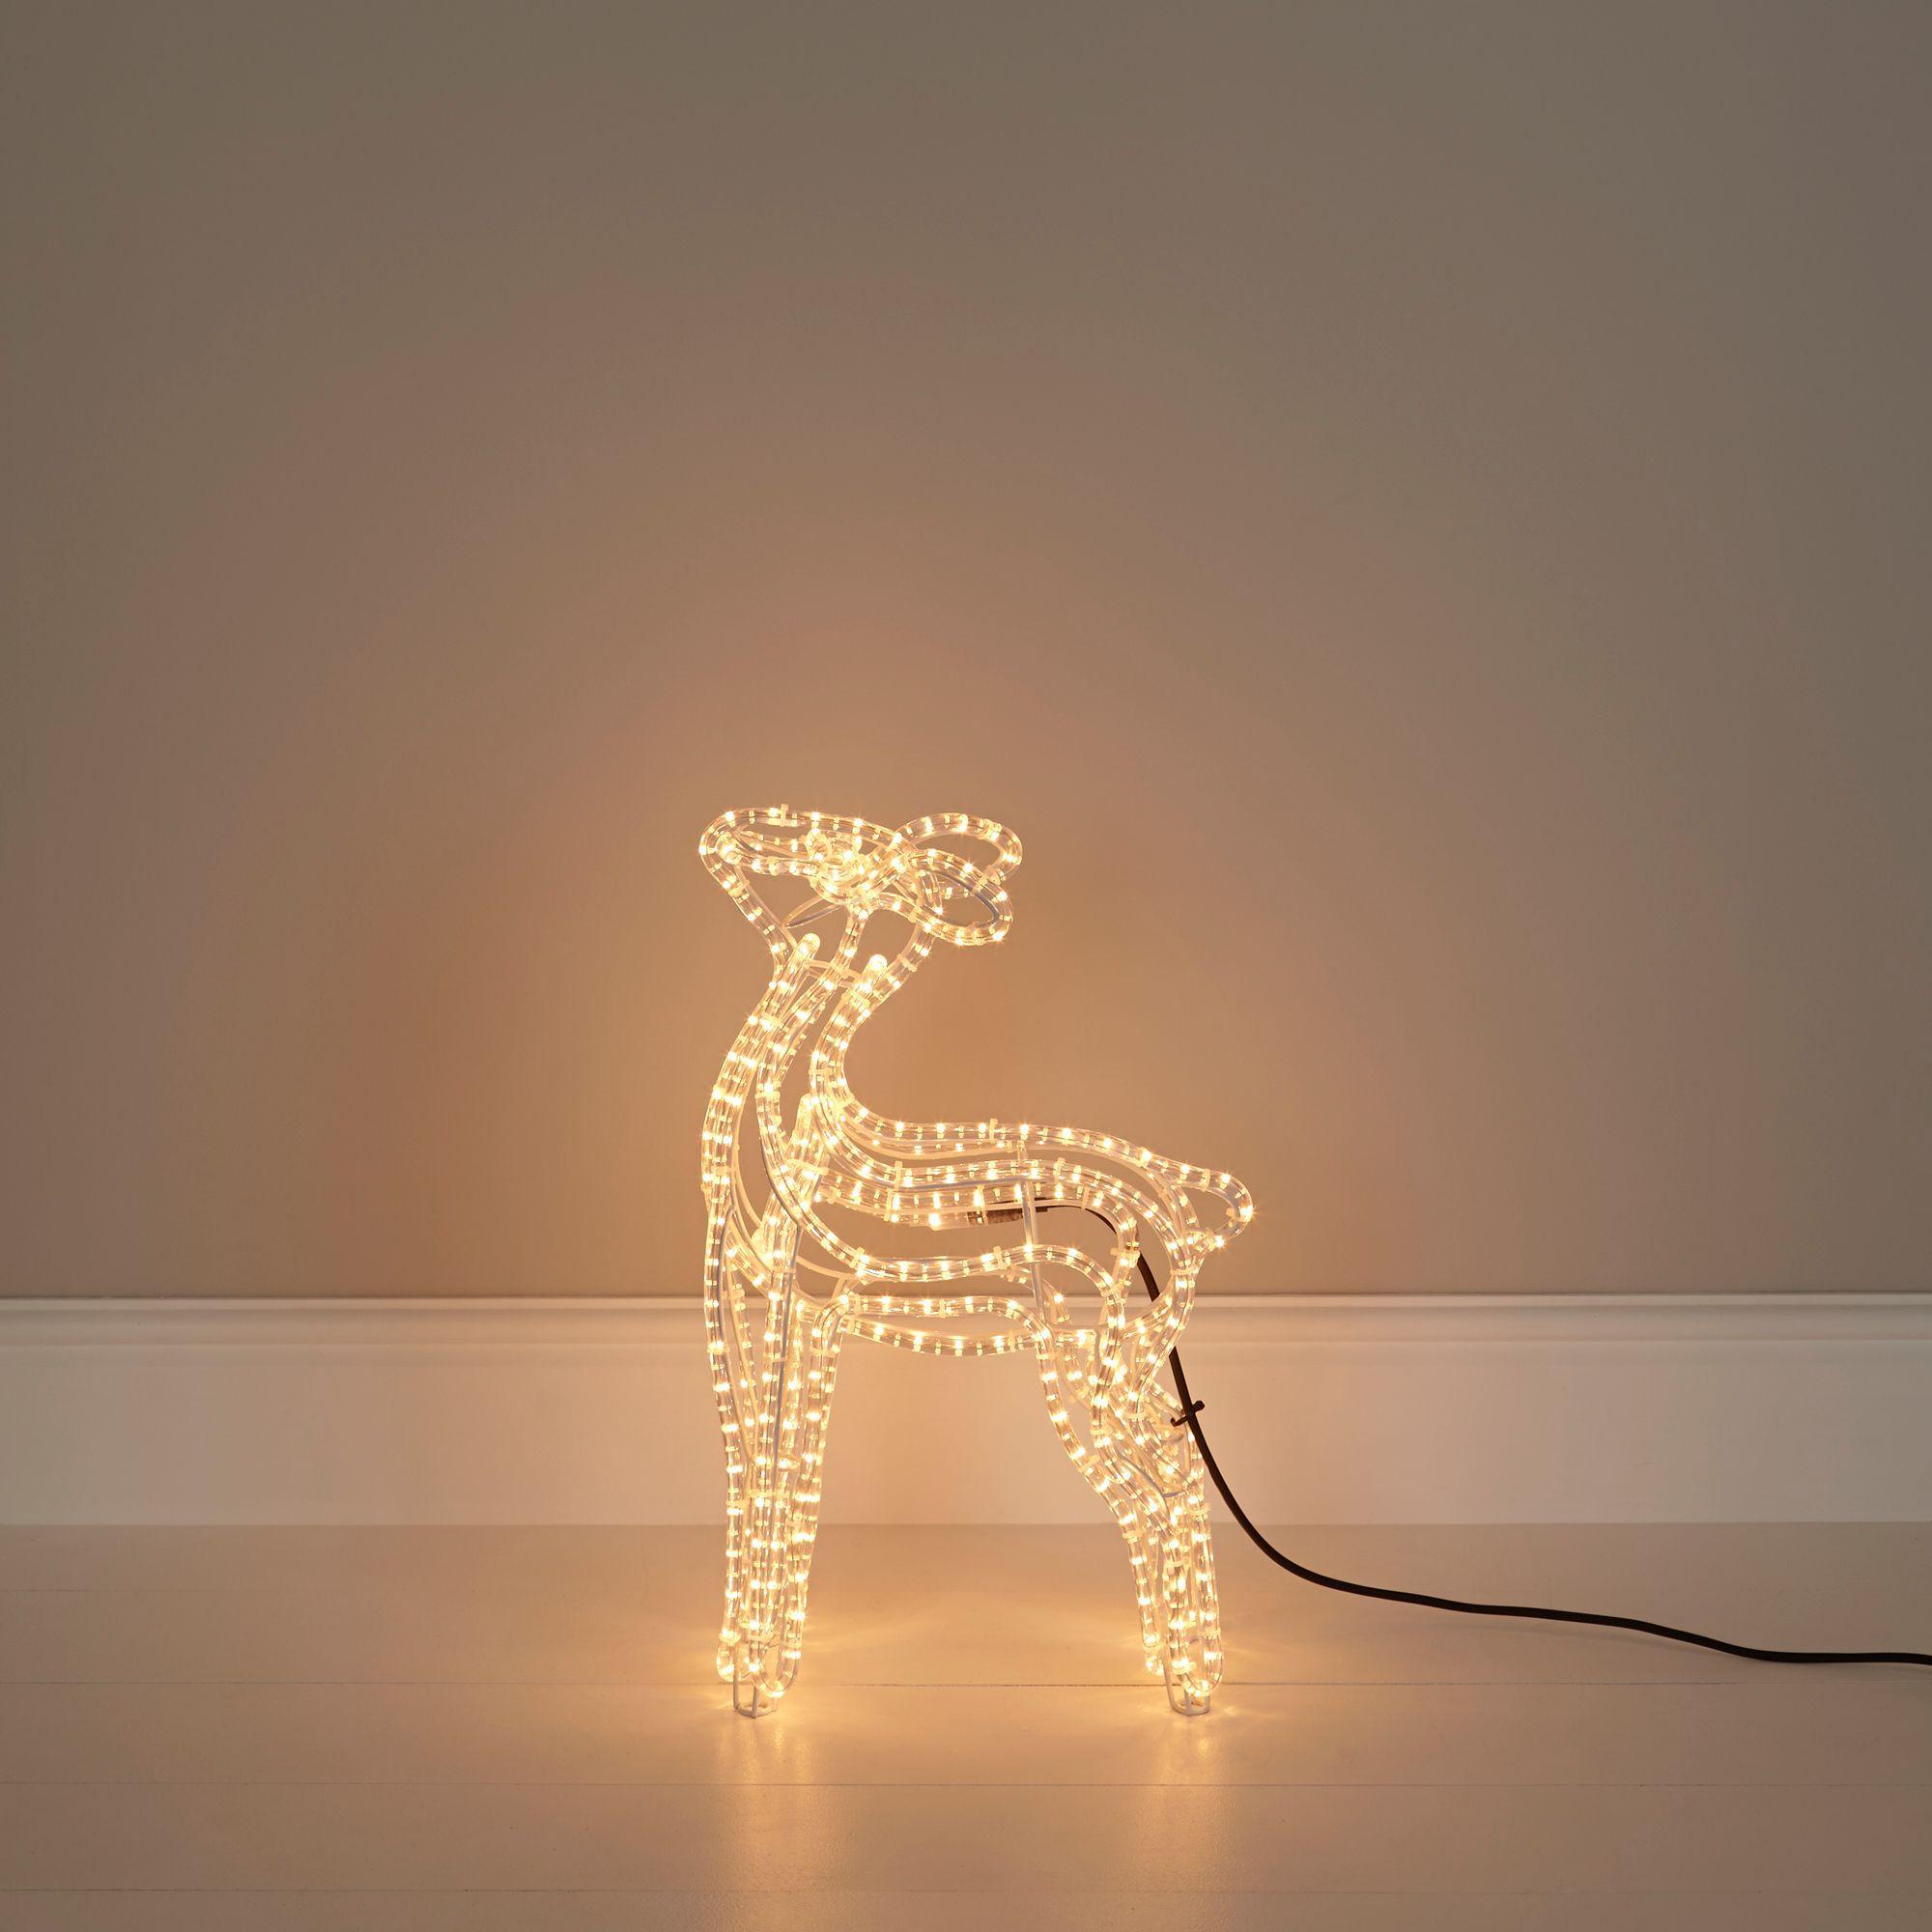 B&q Outdoor Xmas Lights Filament bulb baby reindeer silhouette departments diy at bq workwithnaturefo